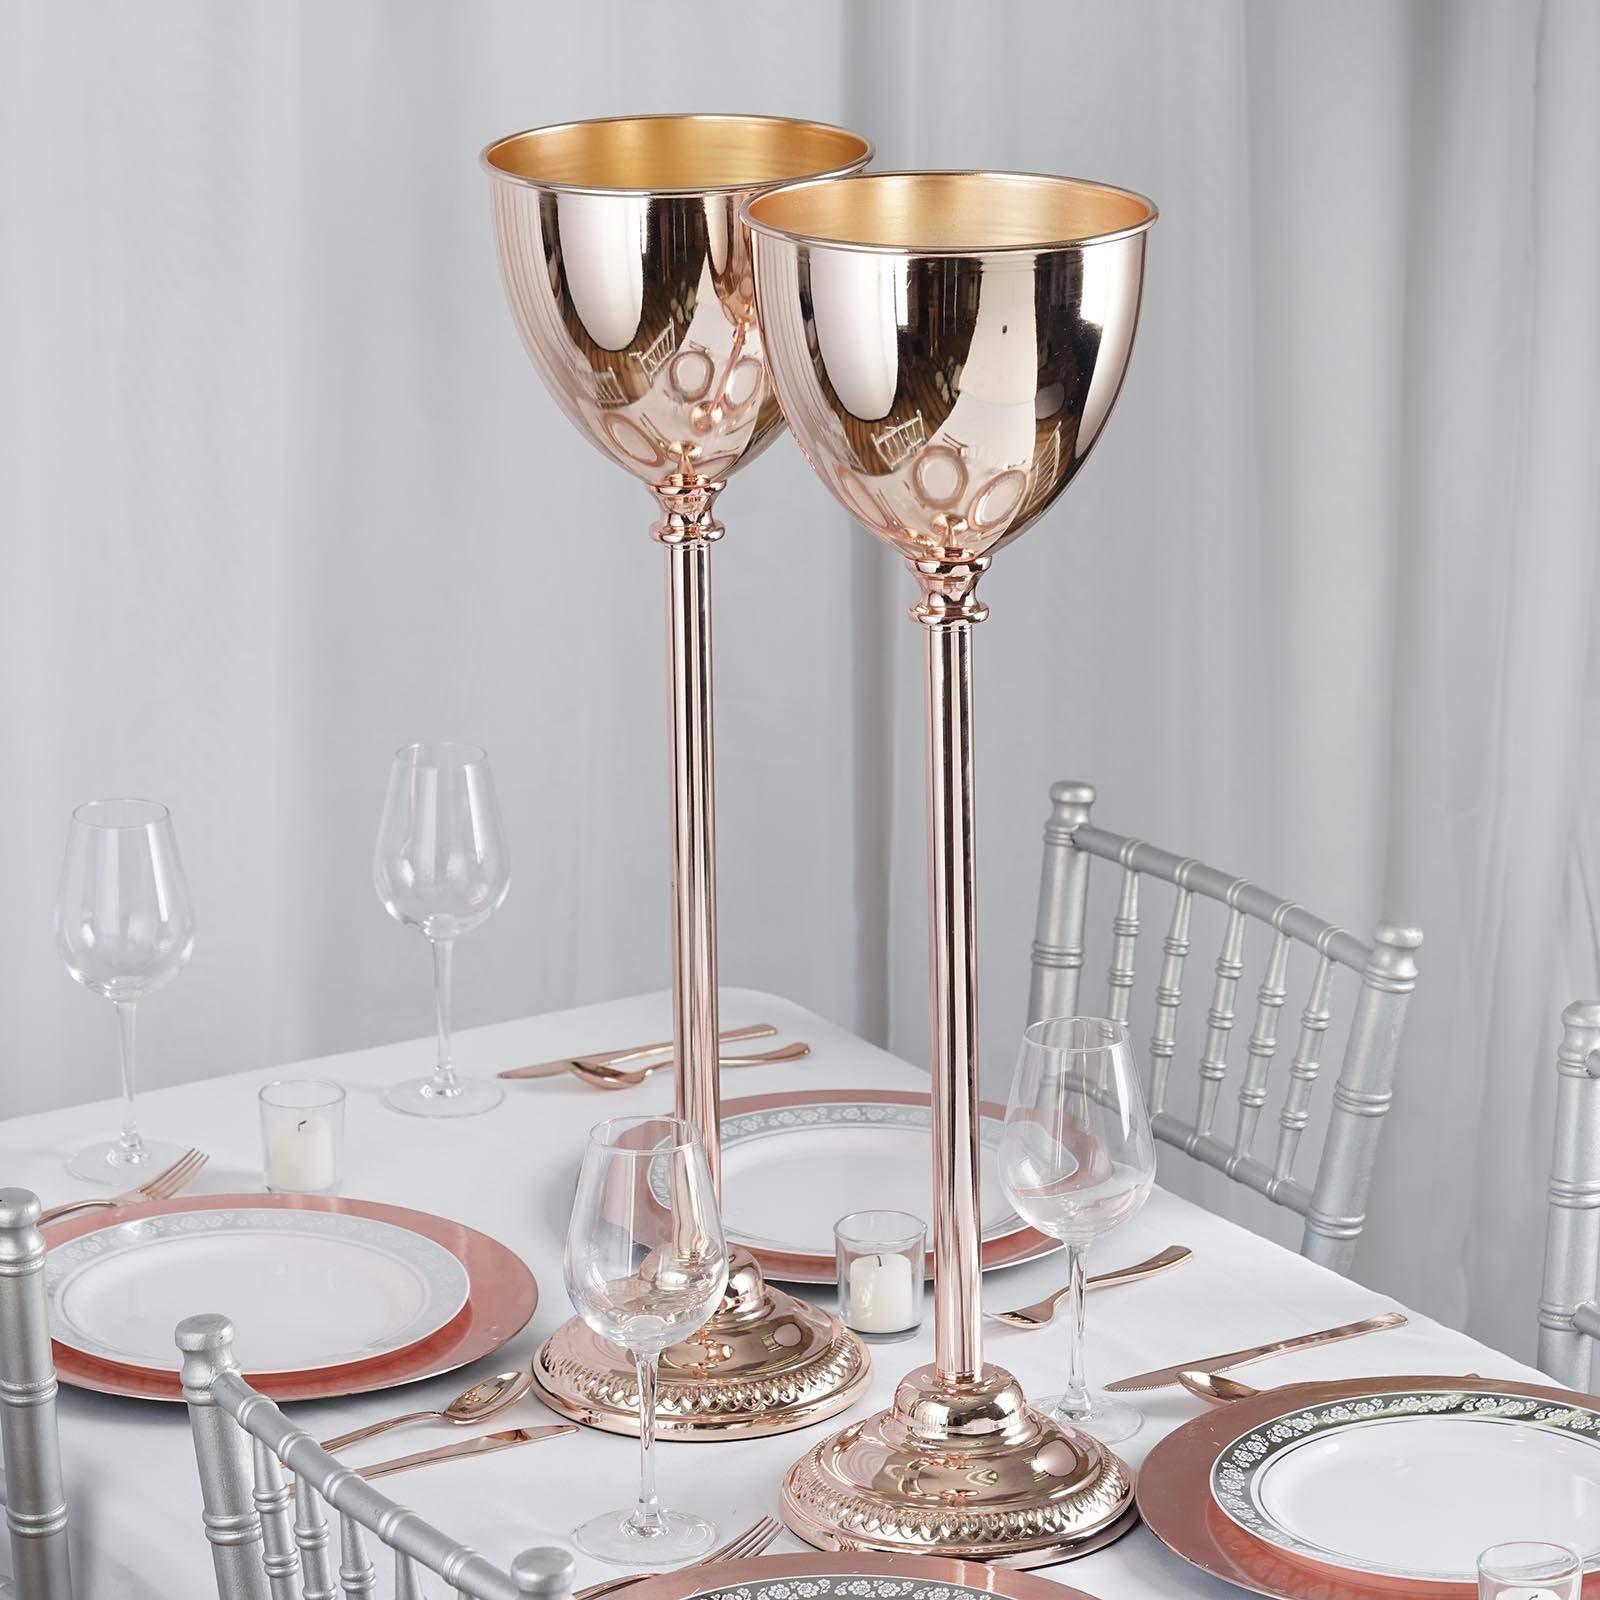 Efavormart 2 Sets 30'' Tall Rose Gold Metallic Floral Vase W/Candle Holder Wedding Centerpiece Stand